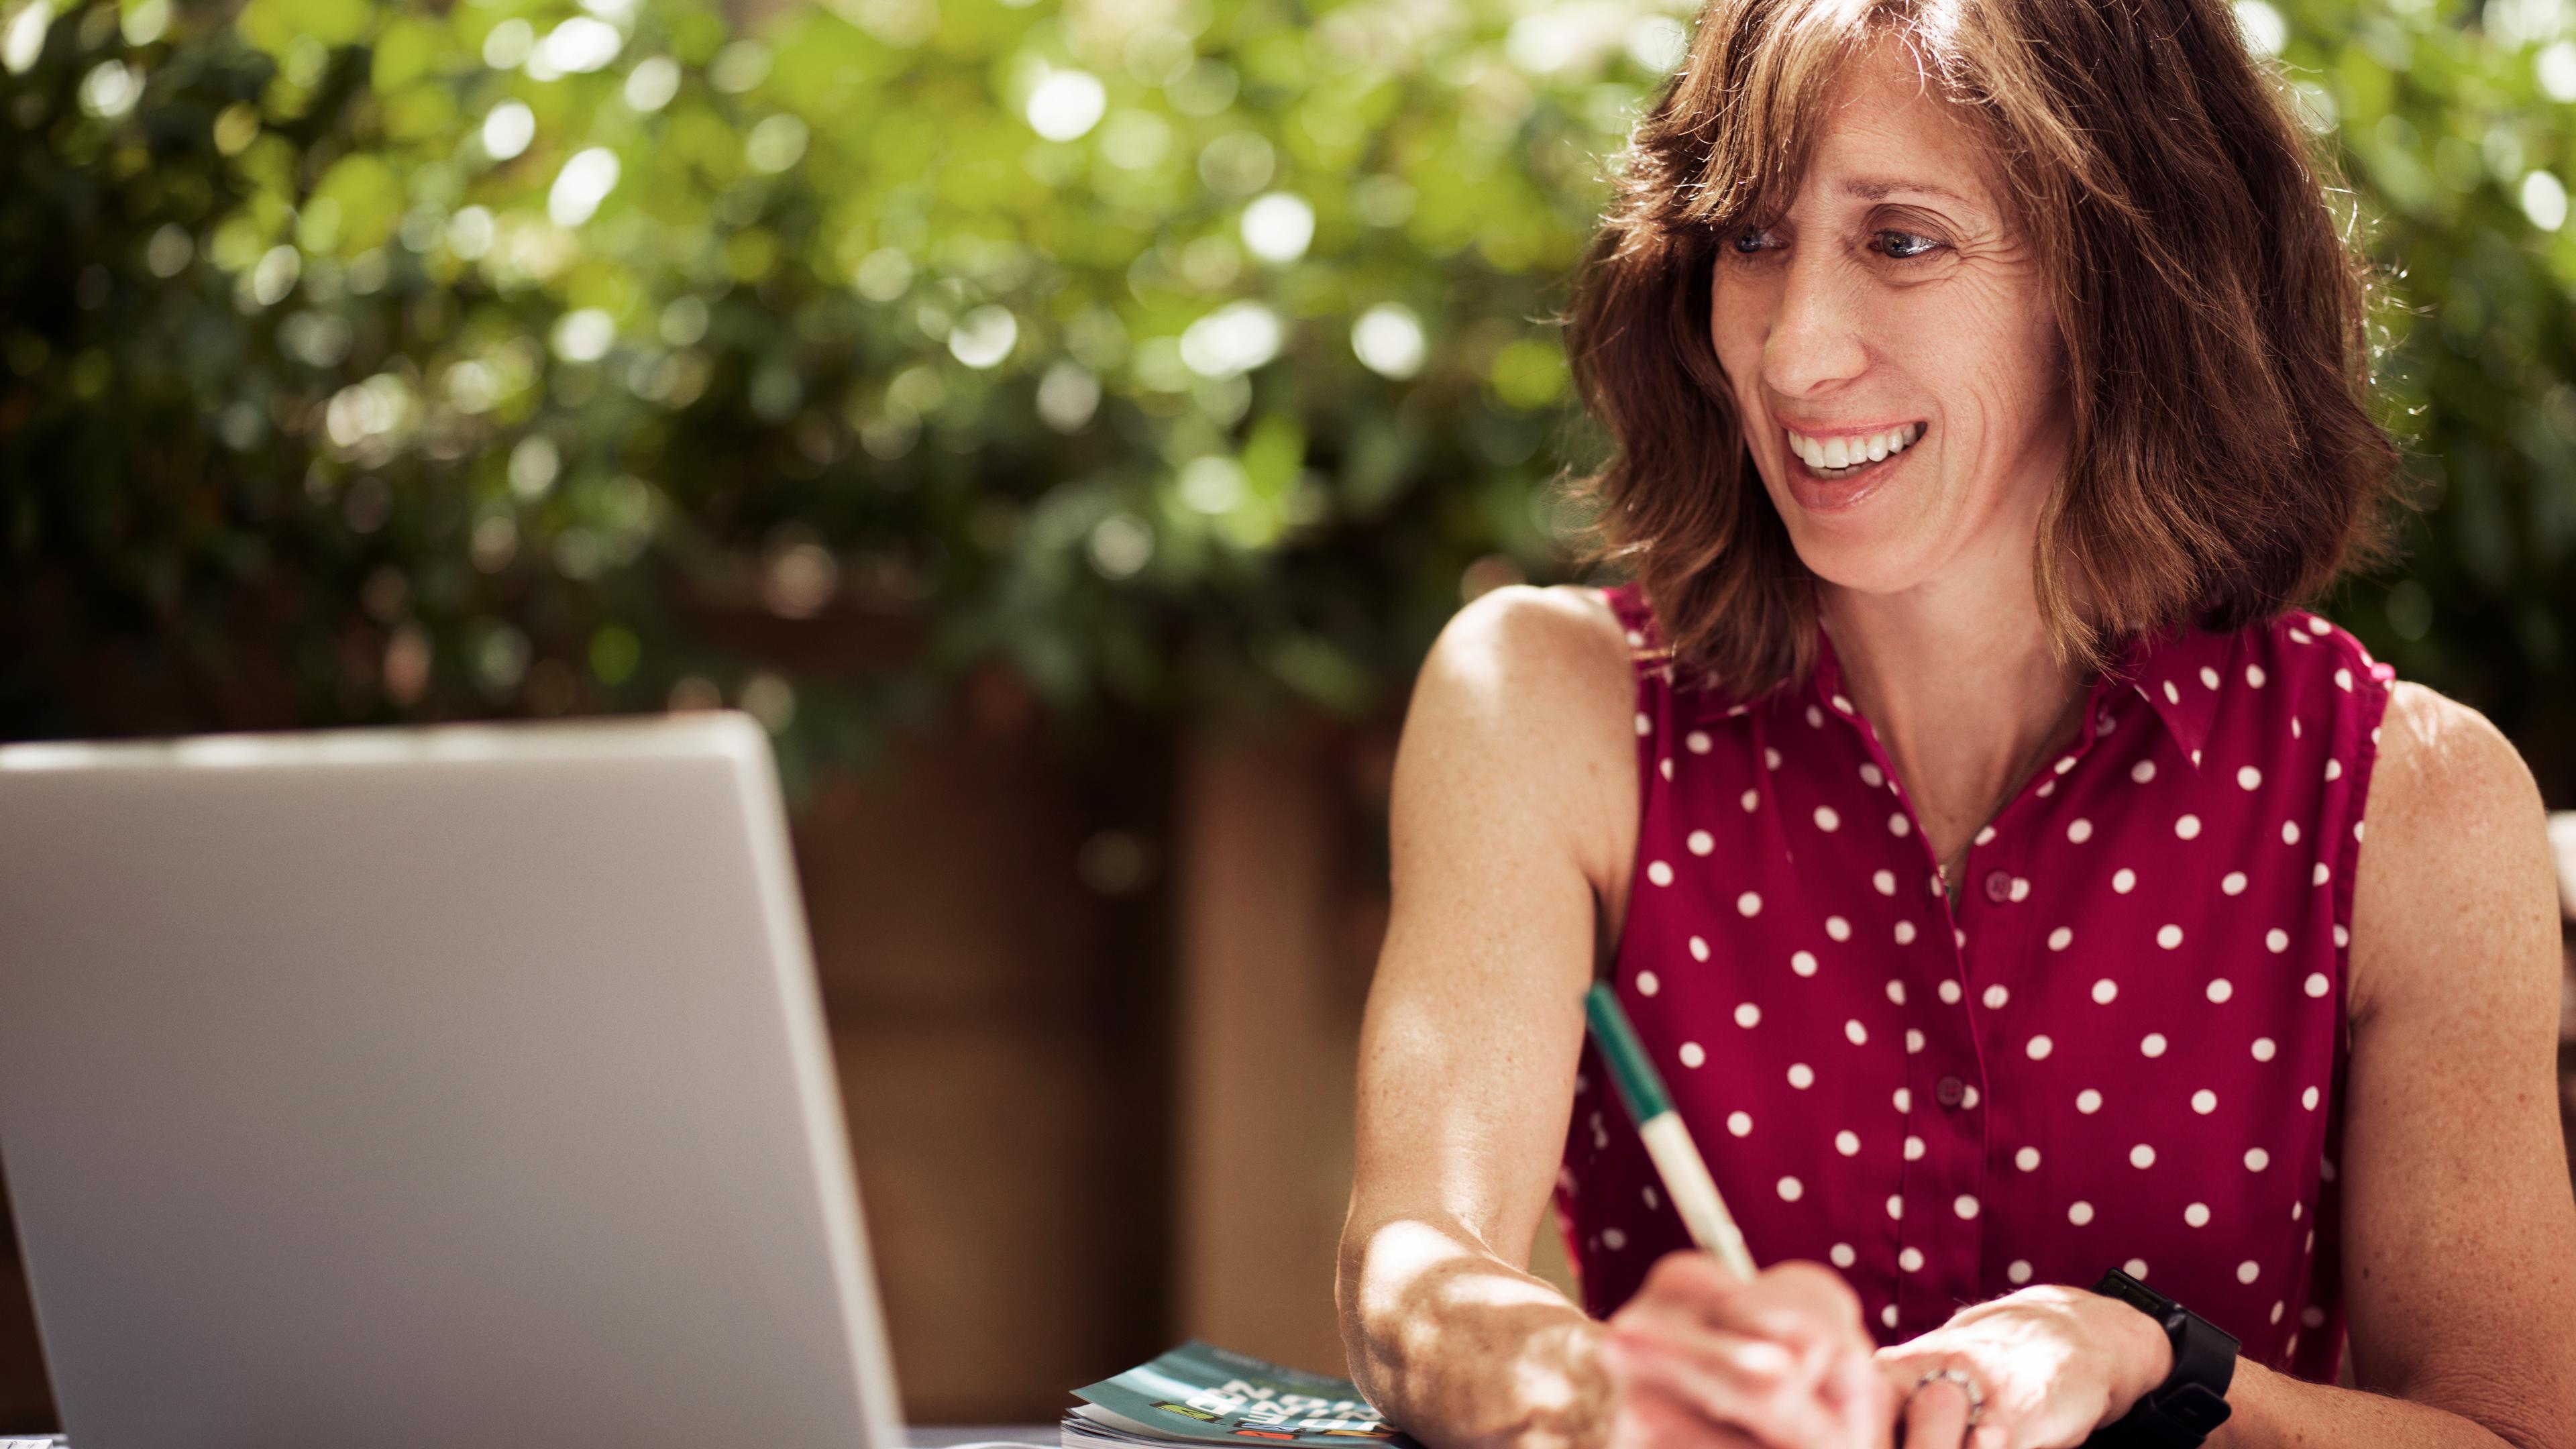 Woman teaching class by computer